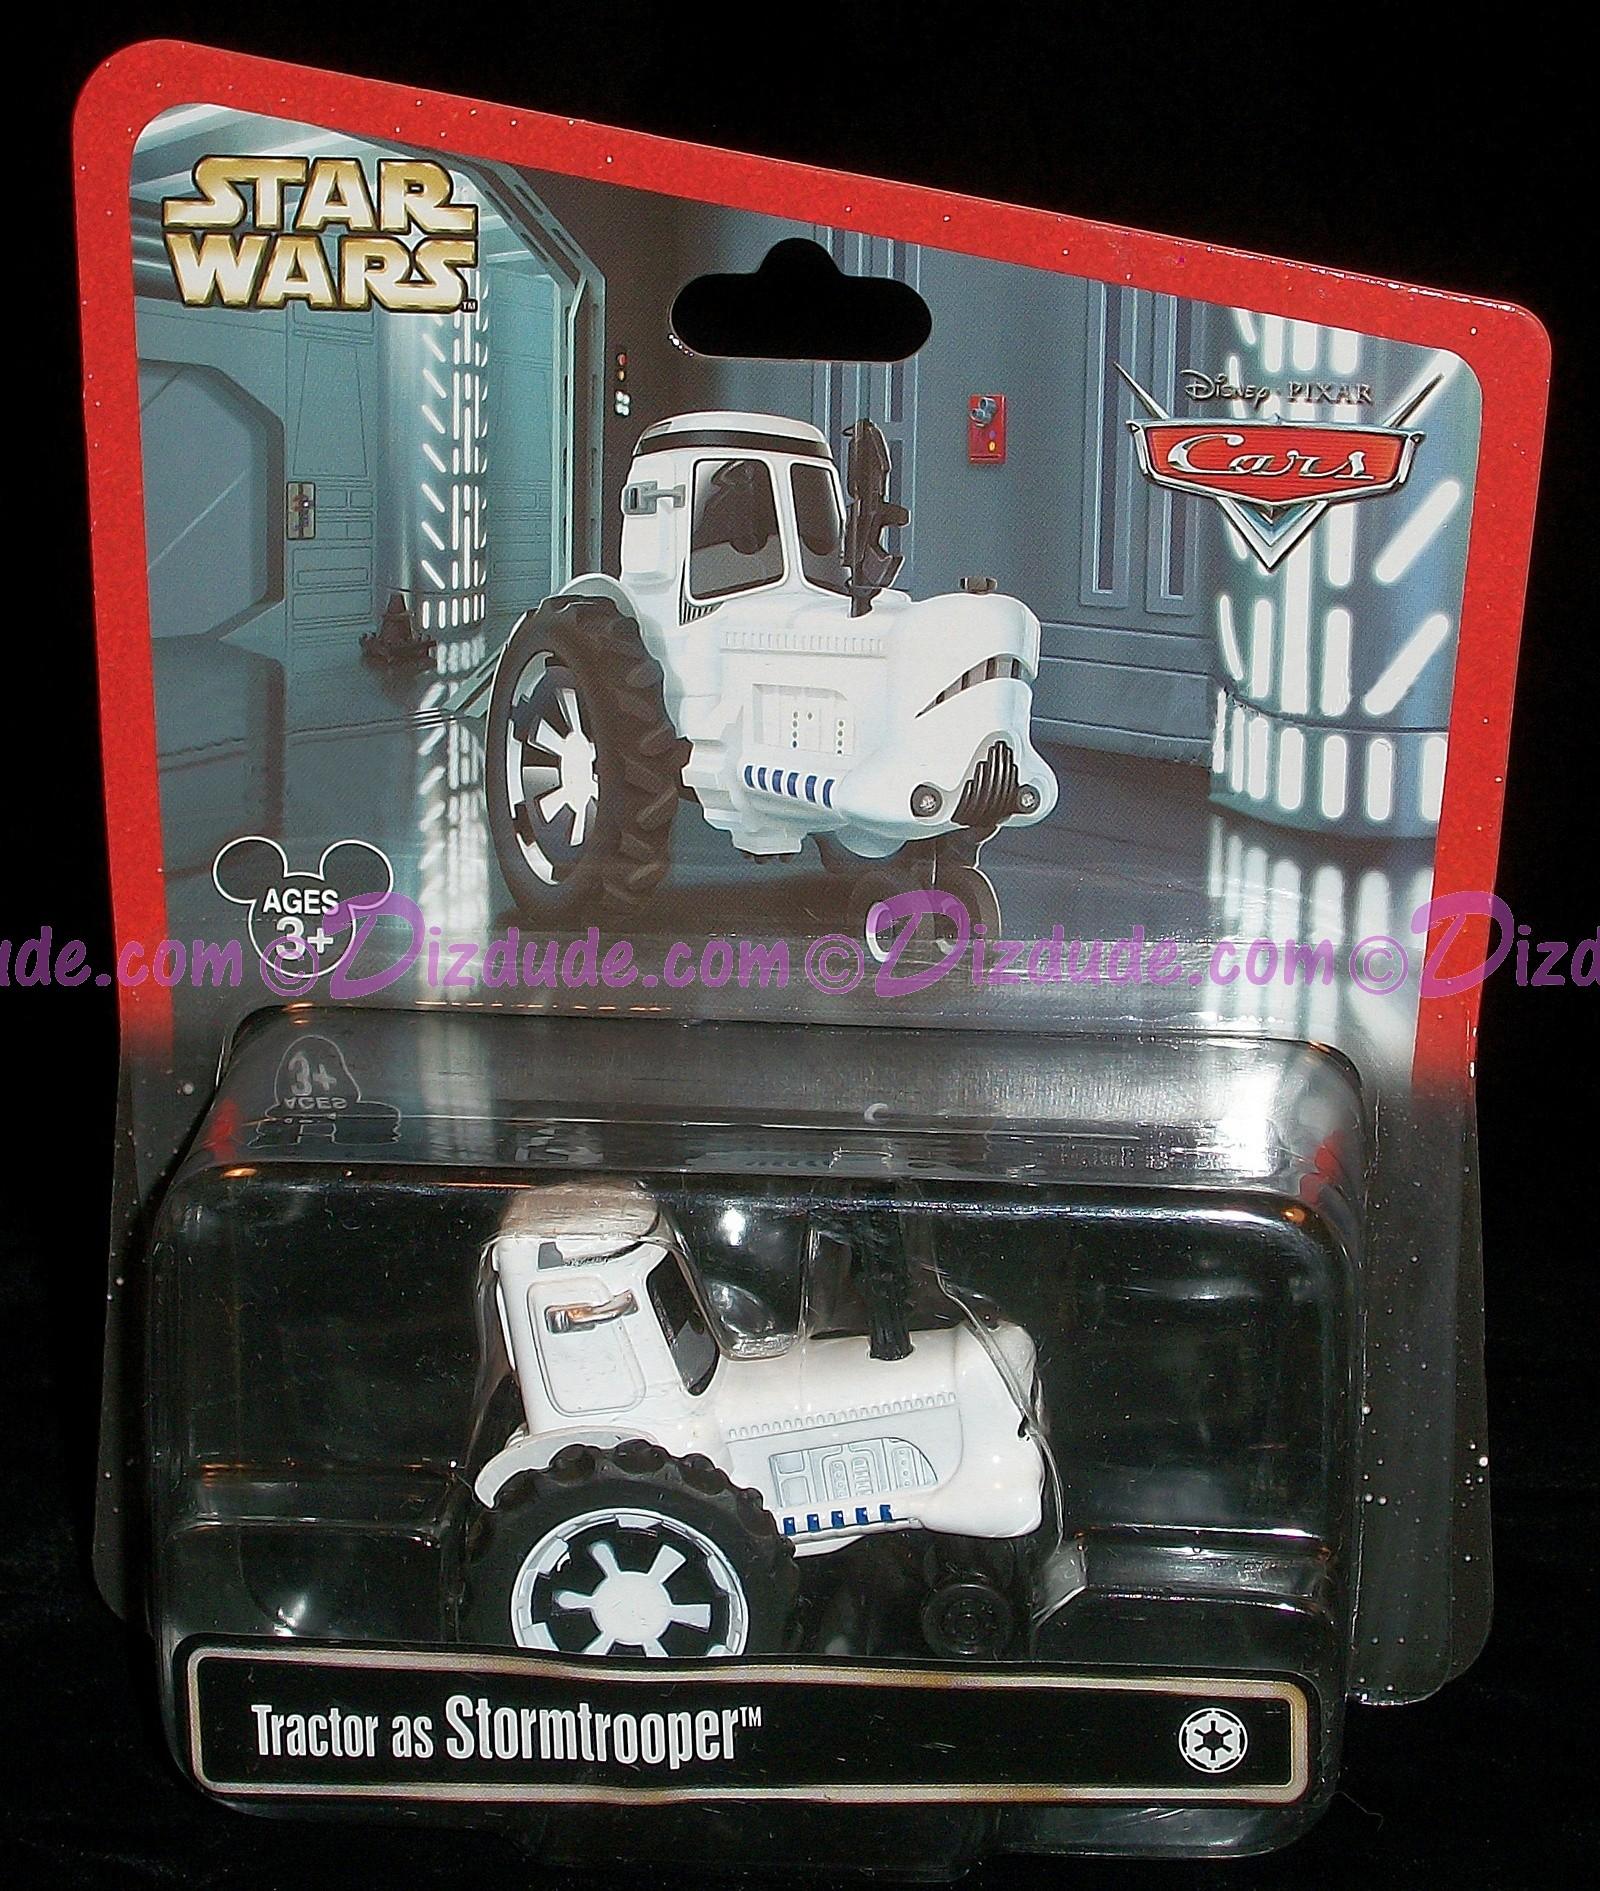 "Disney Pixar ""Cars"" Tractor as LucasFilms 'Star Wars"" Stormtrooper Racer for Star Wars Weekends 2013 -Series 1 © Dizdude.com"